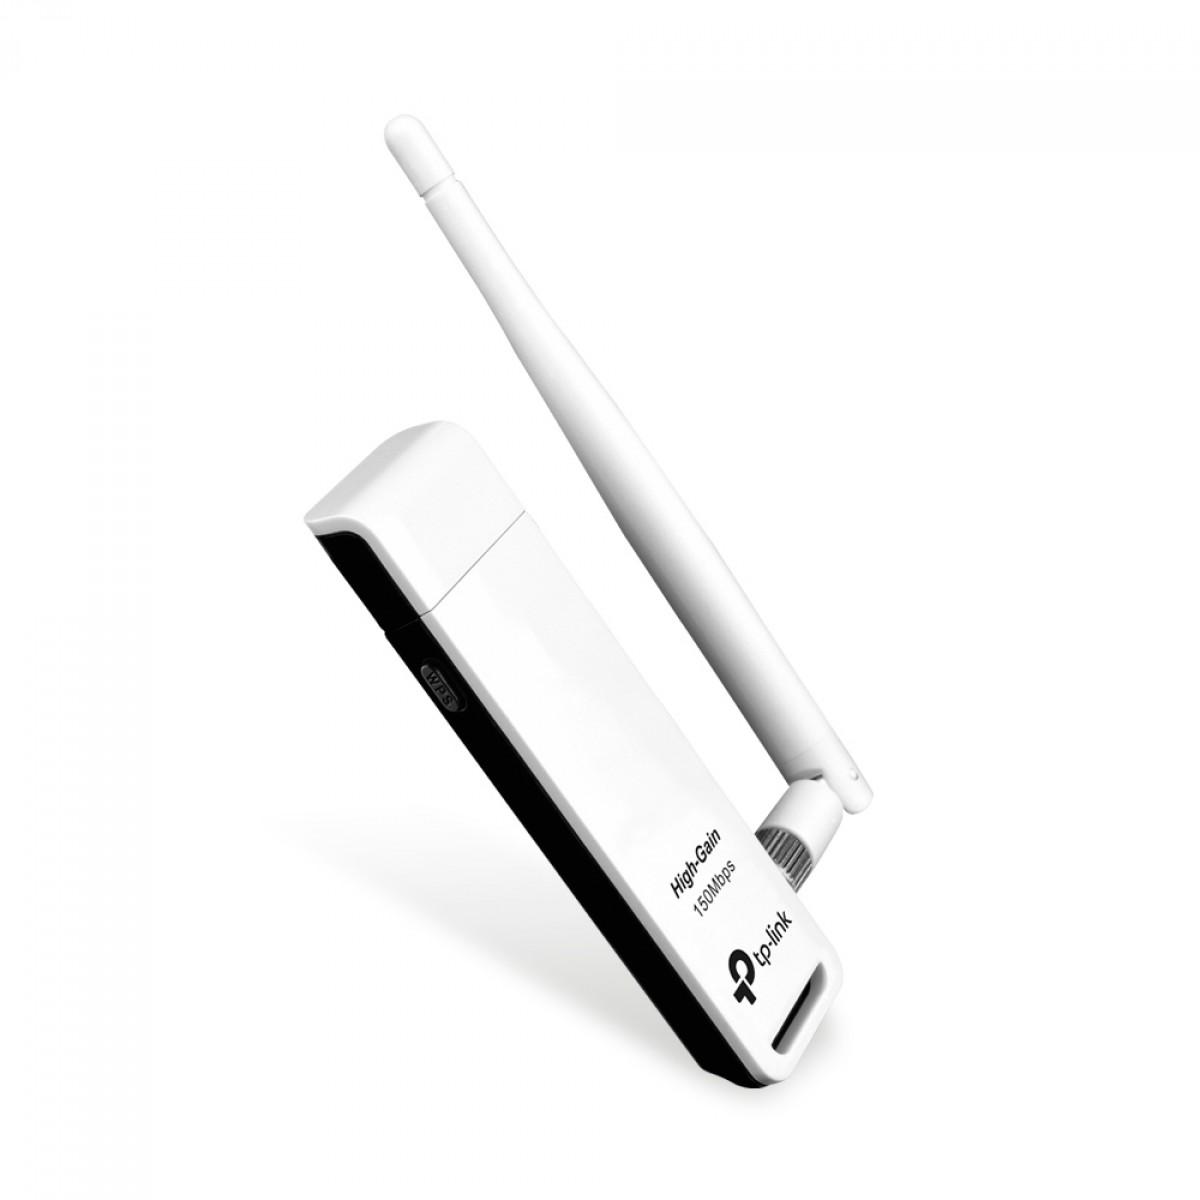 Adaptador Wireless N USB TP-Link, 150Mbps, TL-WN722N